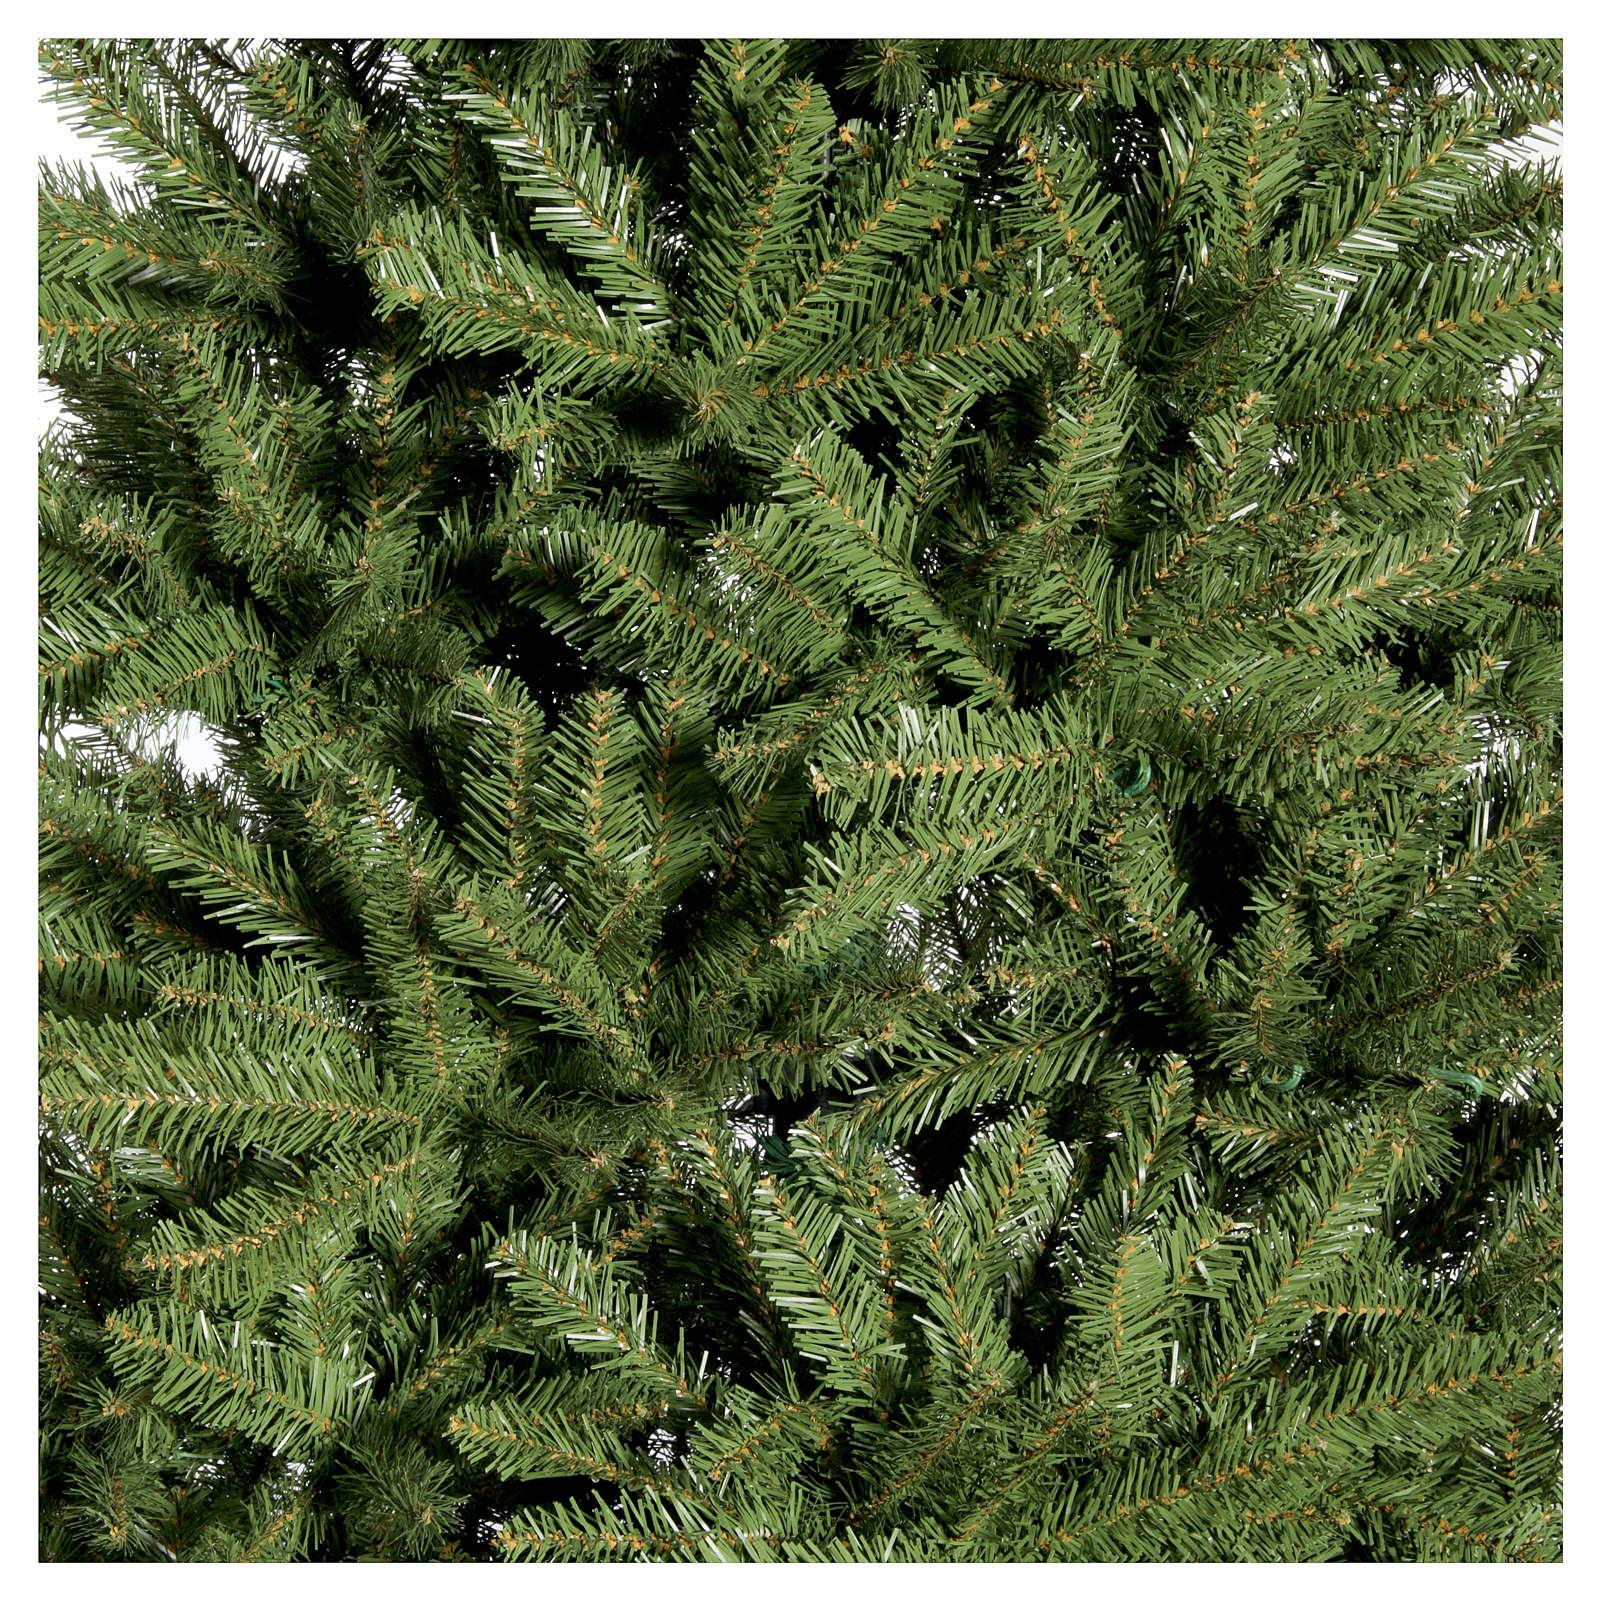 Albero di Natale 210 cm verde Dunhill Fir 3